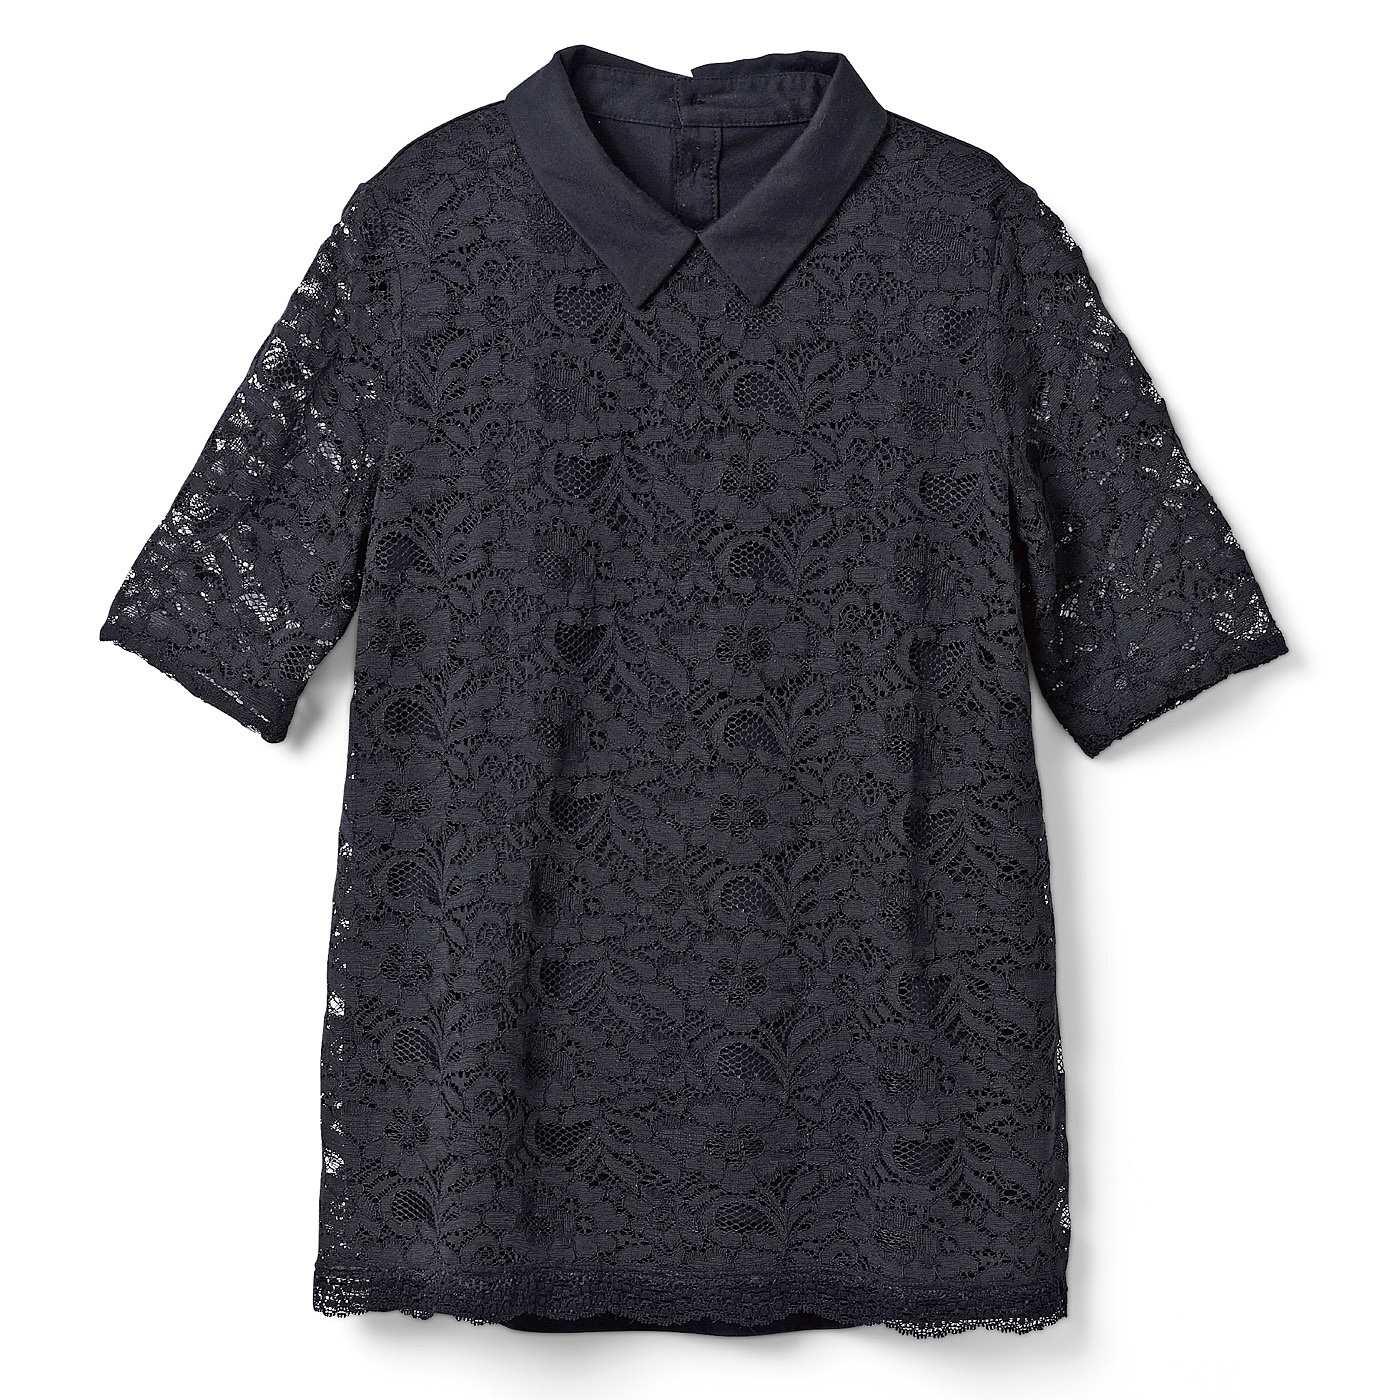 DRECO by IEDIT 着るだけで上品華やか!吸汗速乾カットソードッキング衿付きレーストップス<ブラック>